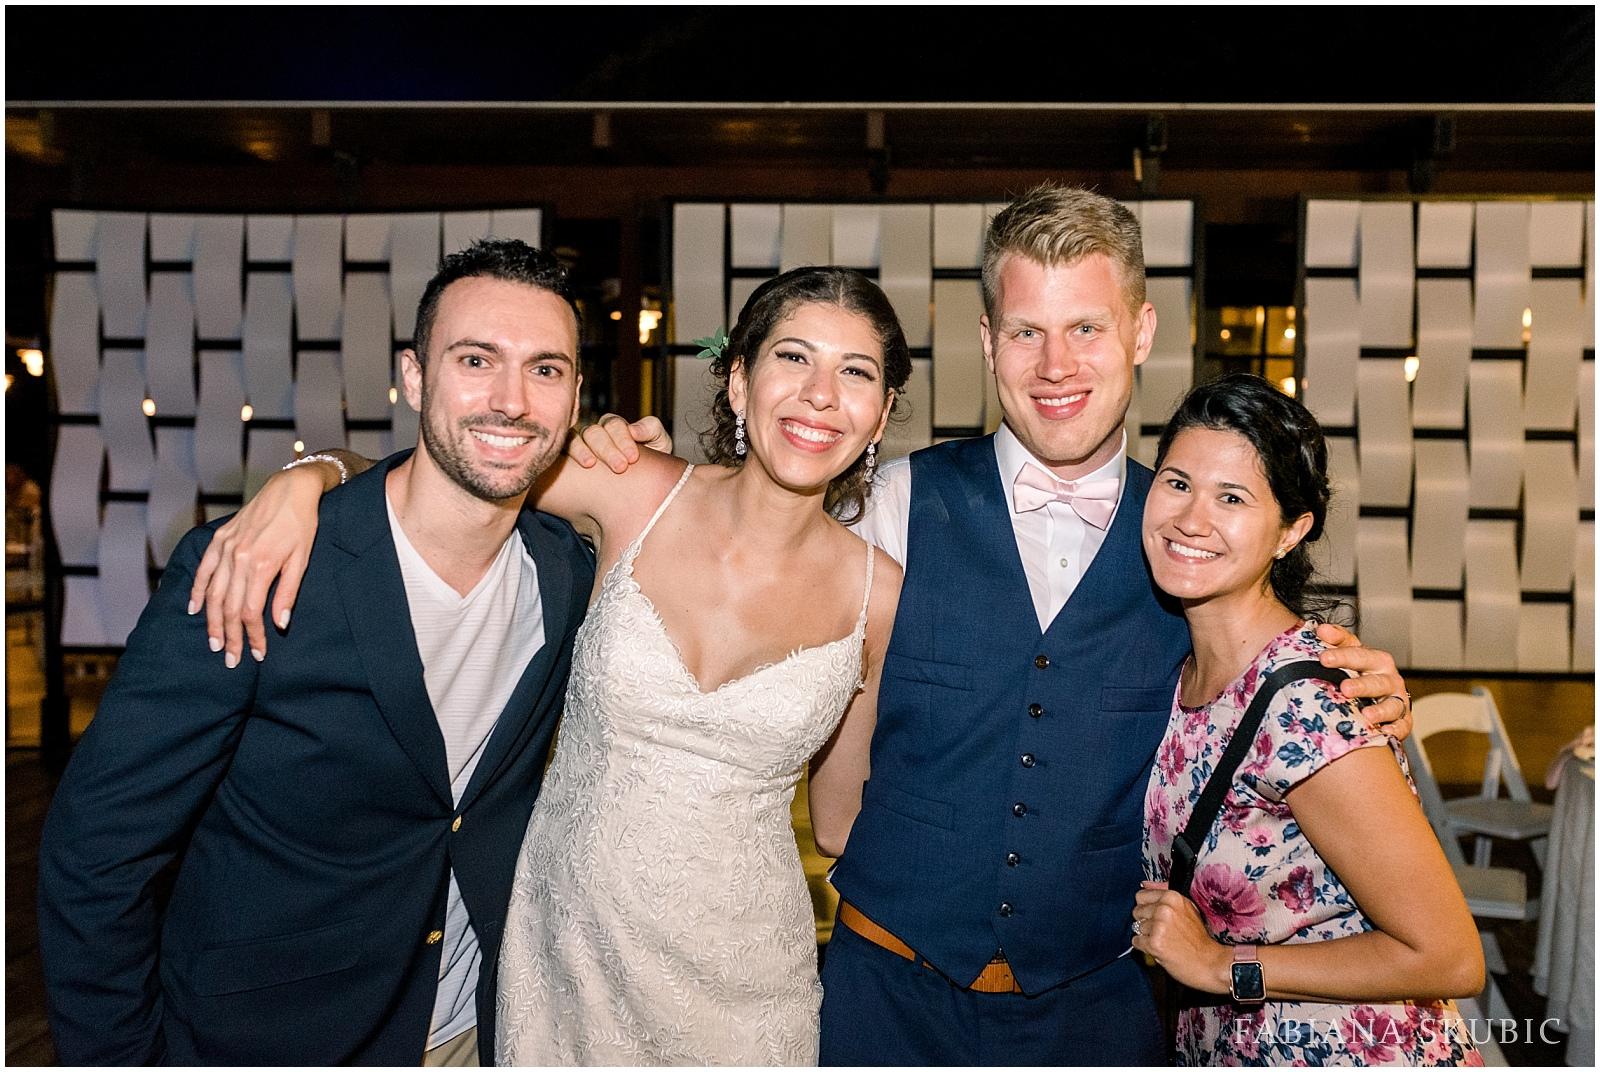 TJ_Now_Sapphire_Riviera_Cancun_Mexico_Wedding_Photos_0291.jpg